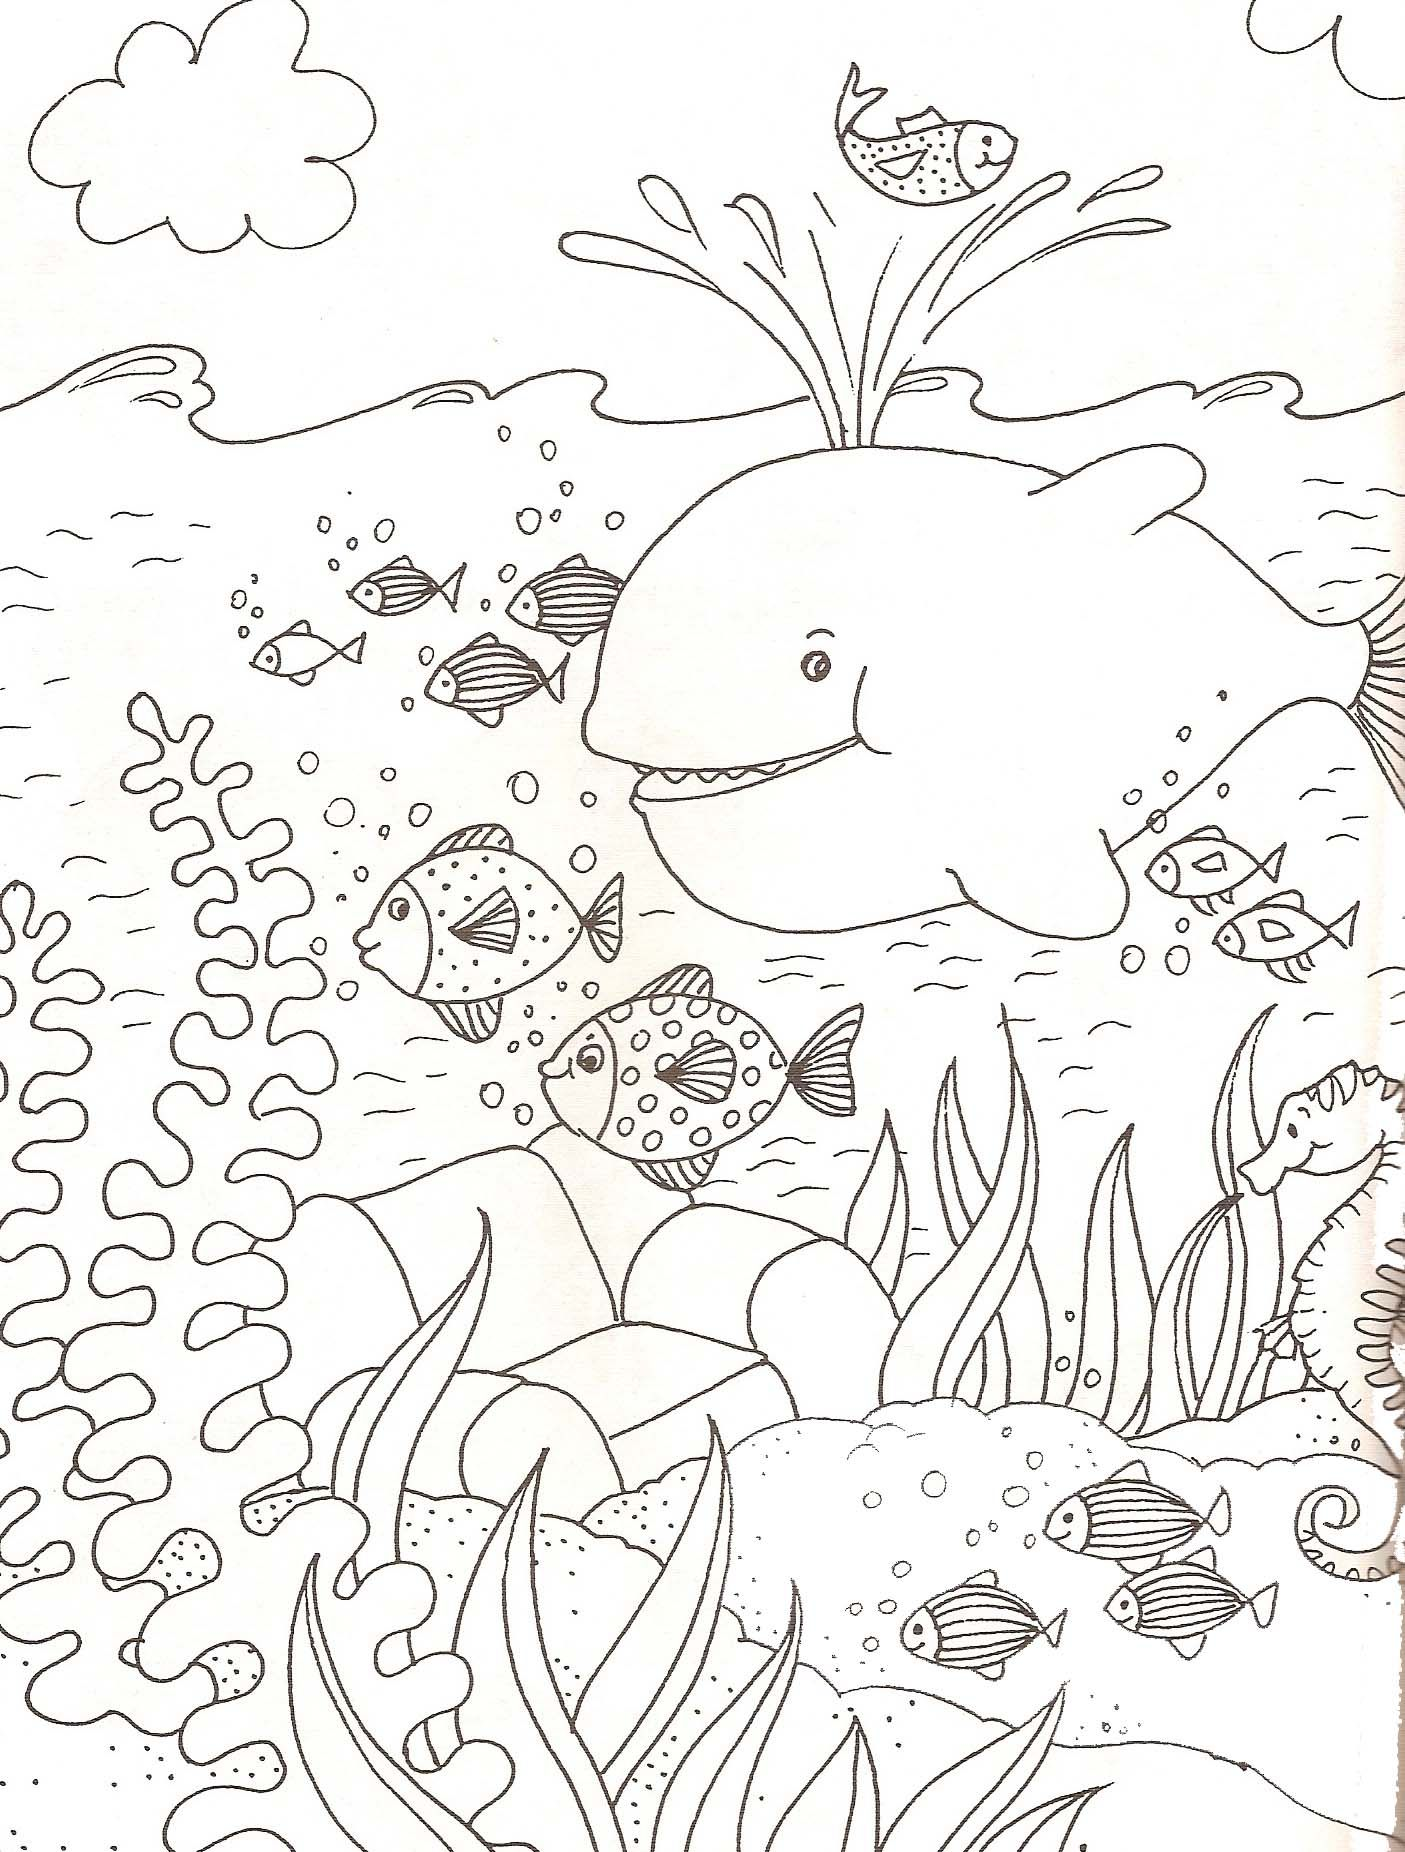 Petit poissons